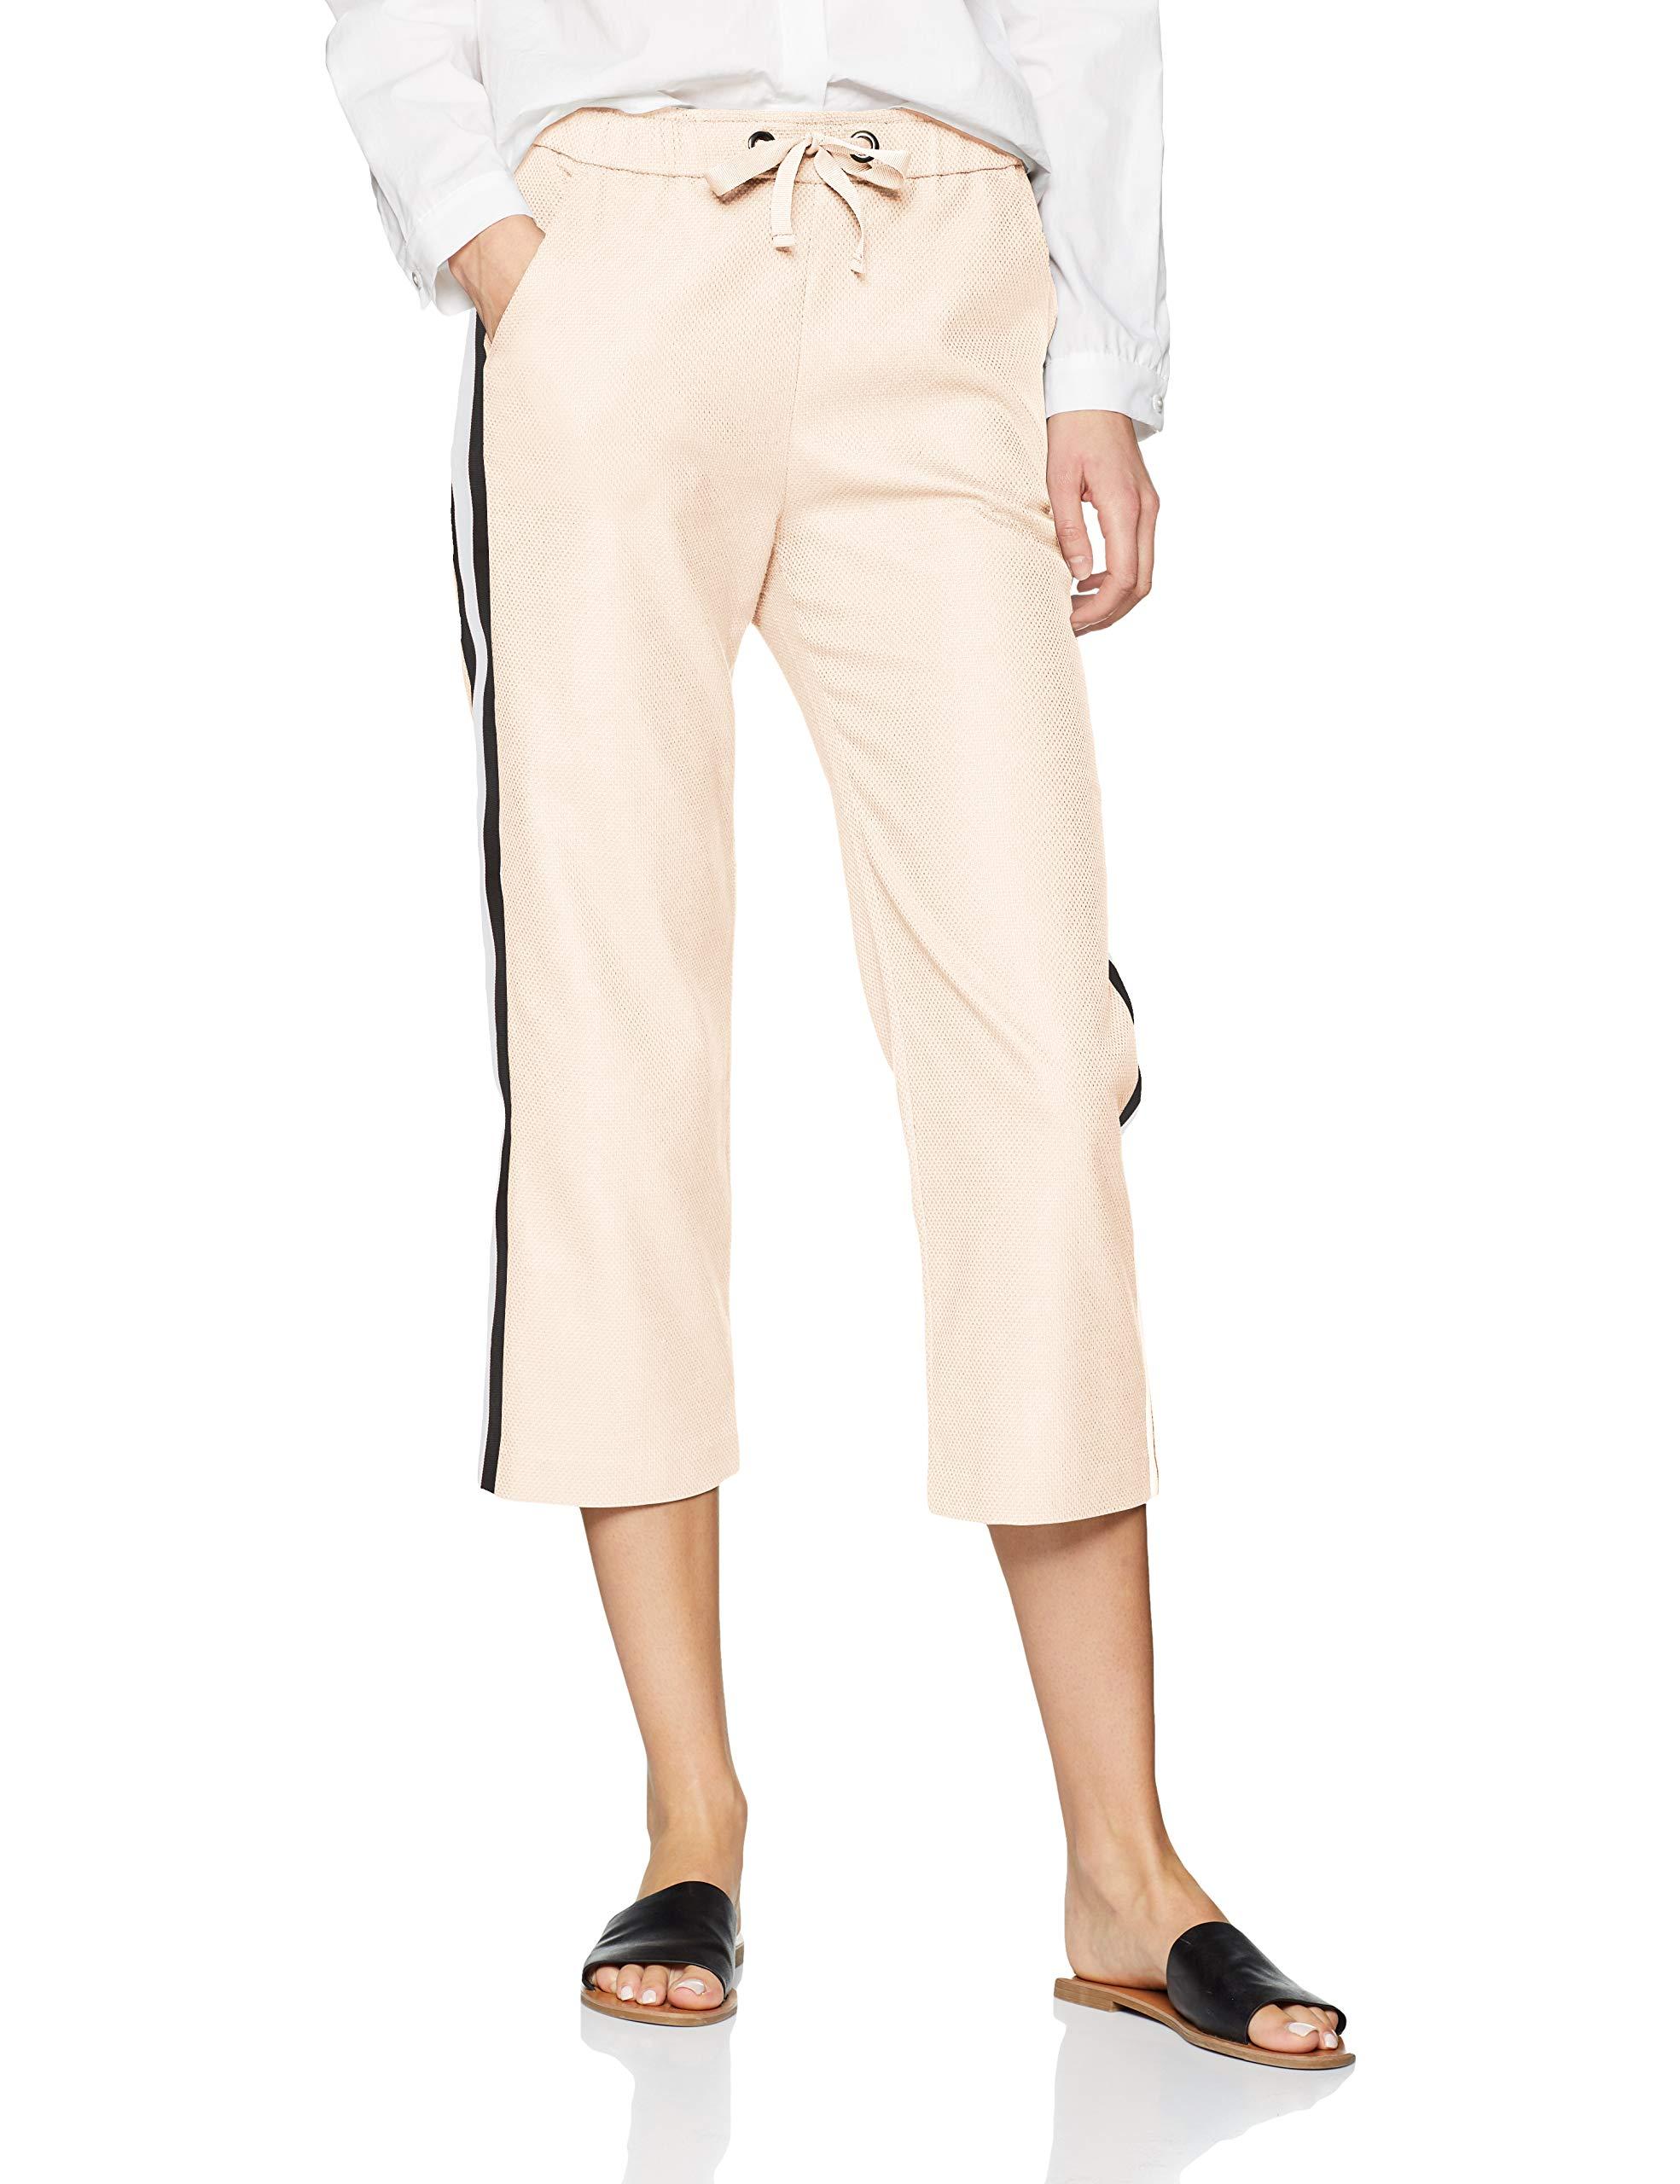 Brûlée PantalonMarroncrème Trousers Fabricant46Femme Sisley 1k9W31taille Rj43L5A